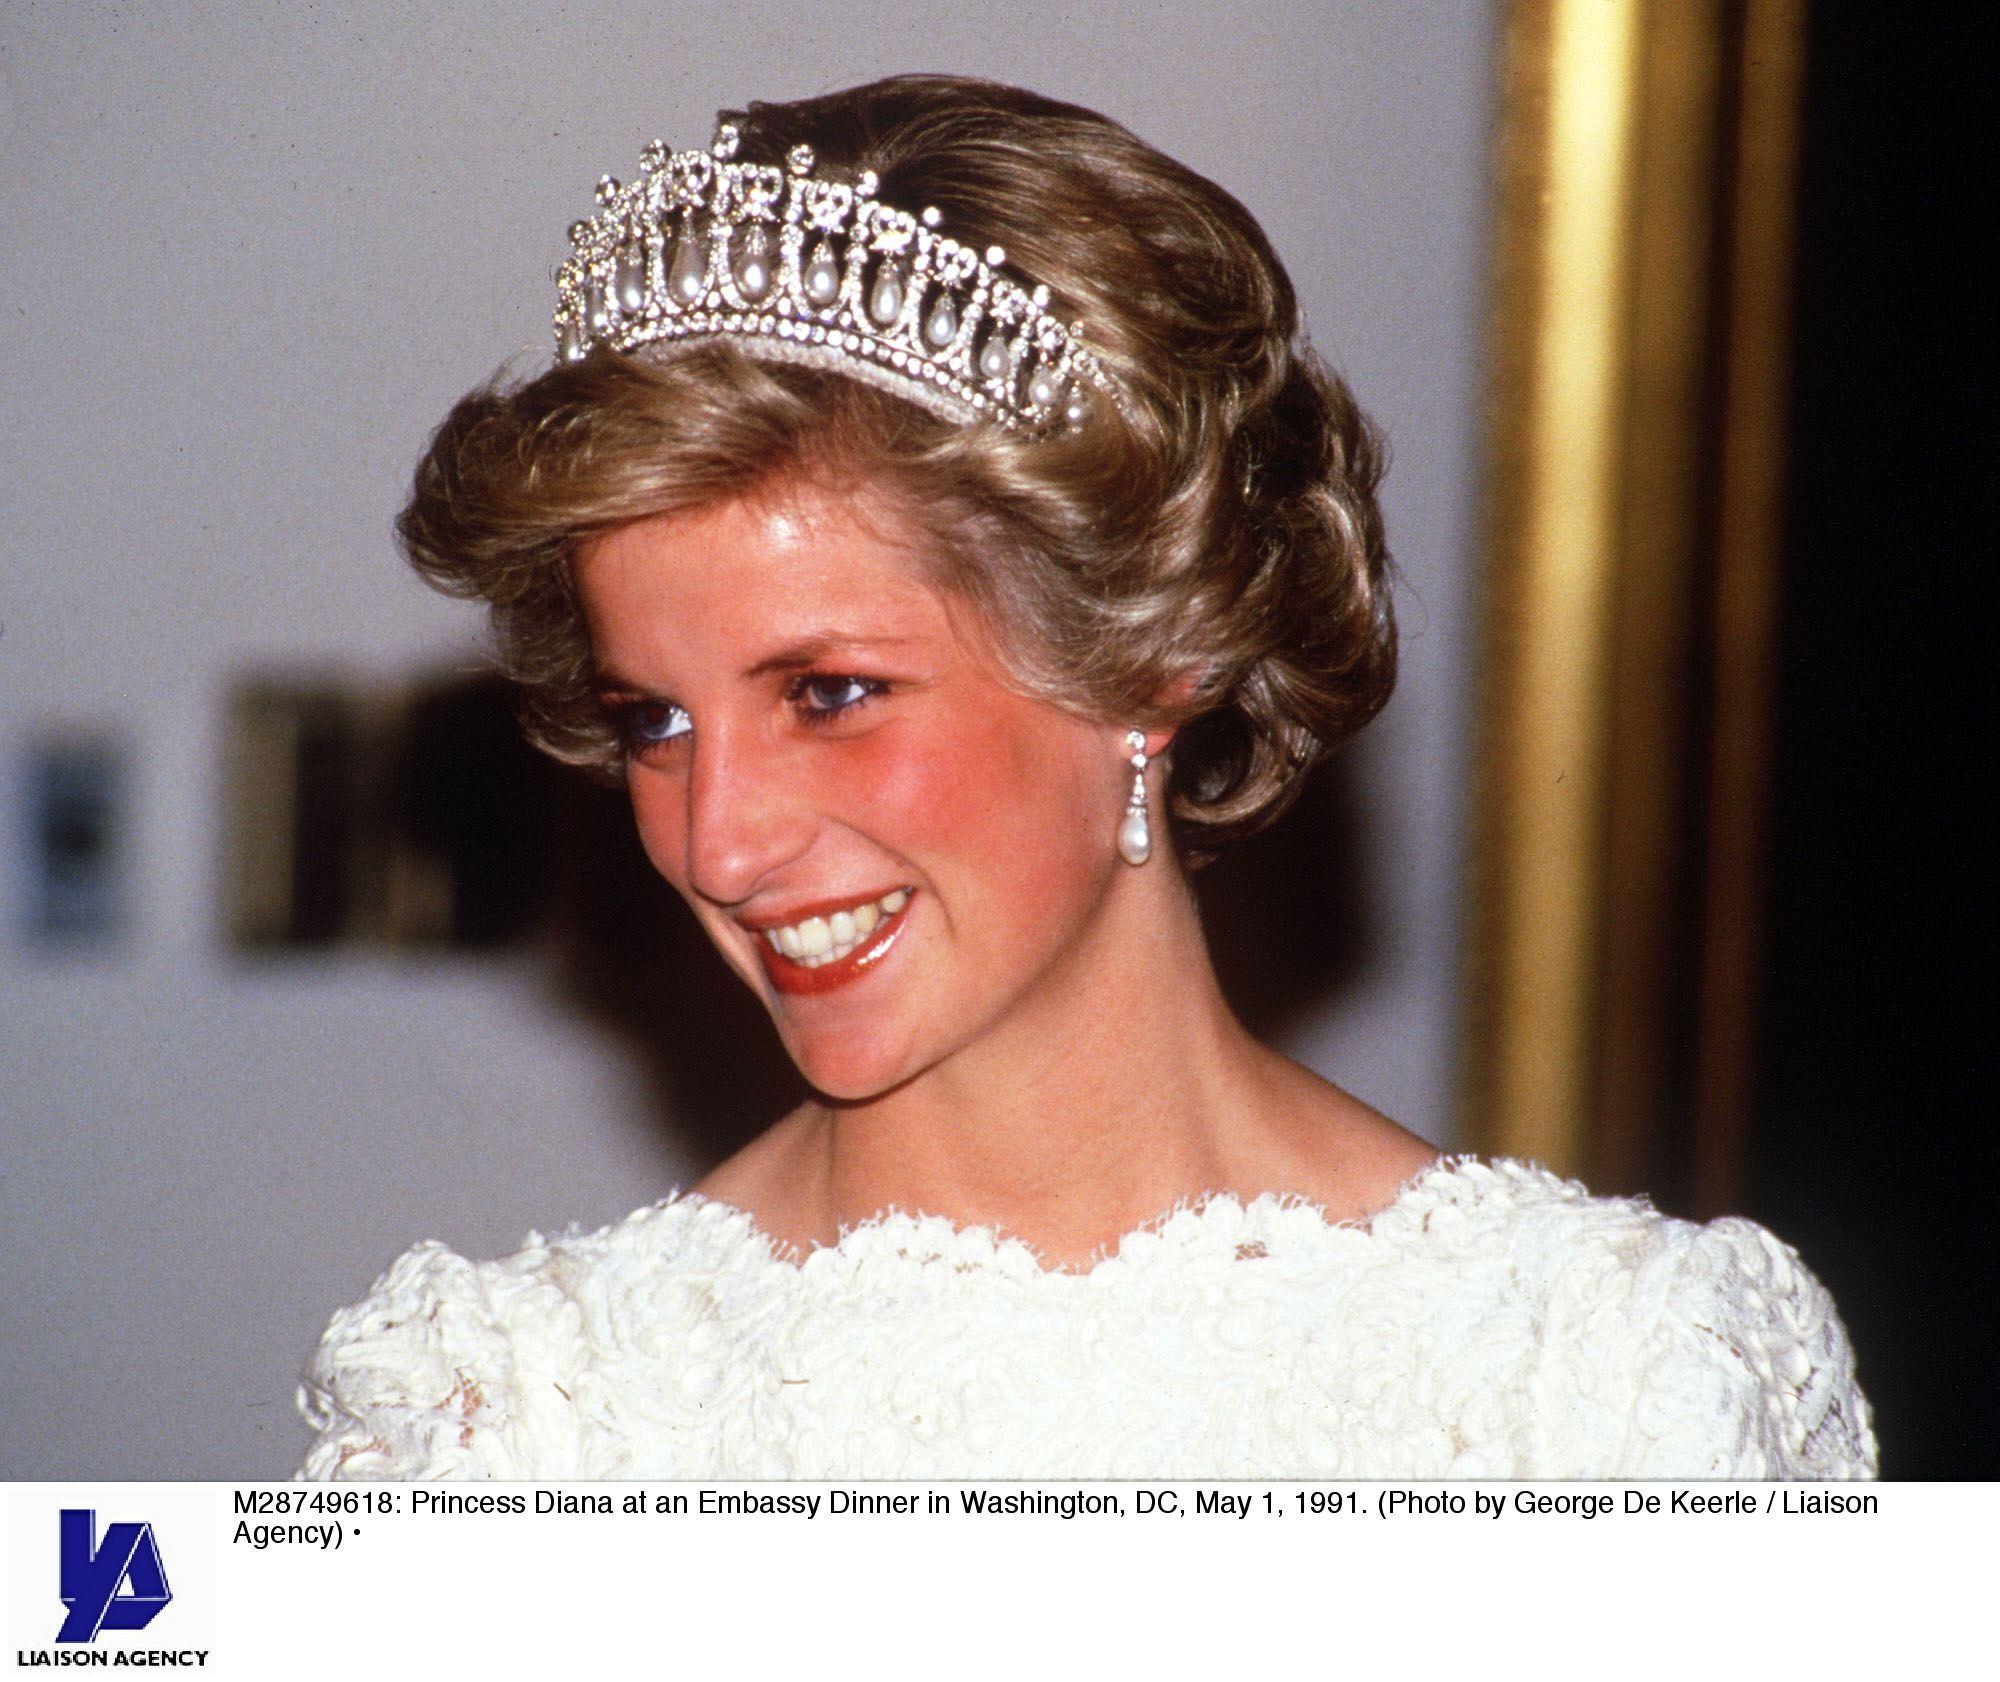 princesa diana, lady di, tiara, favorita